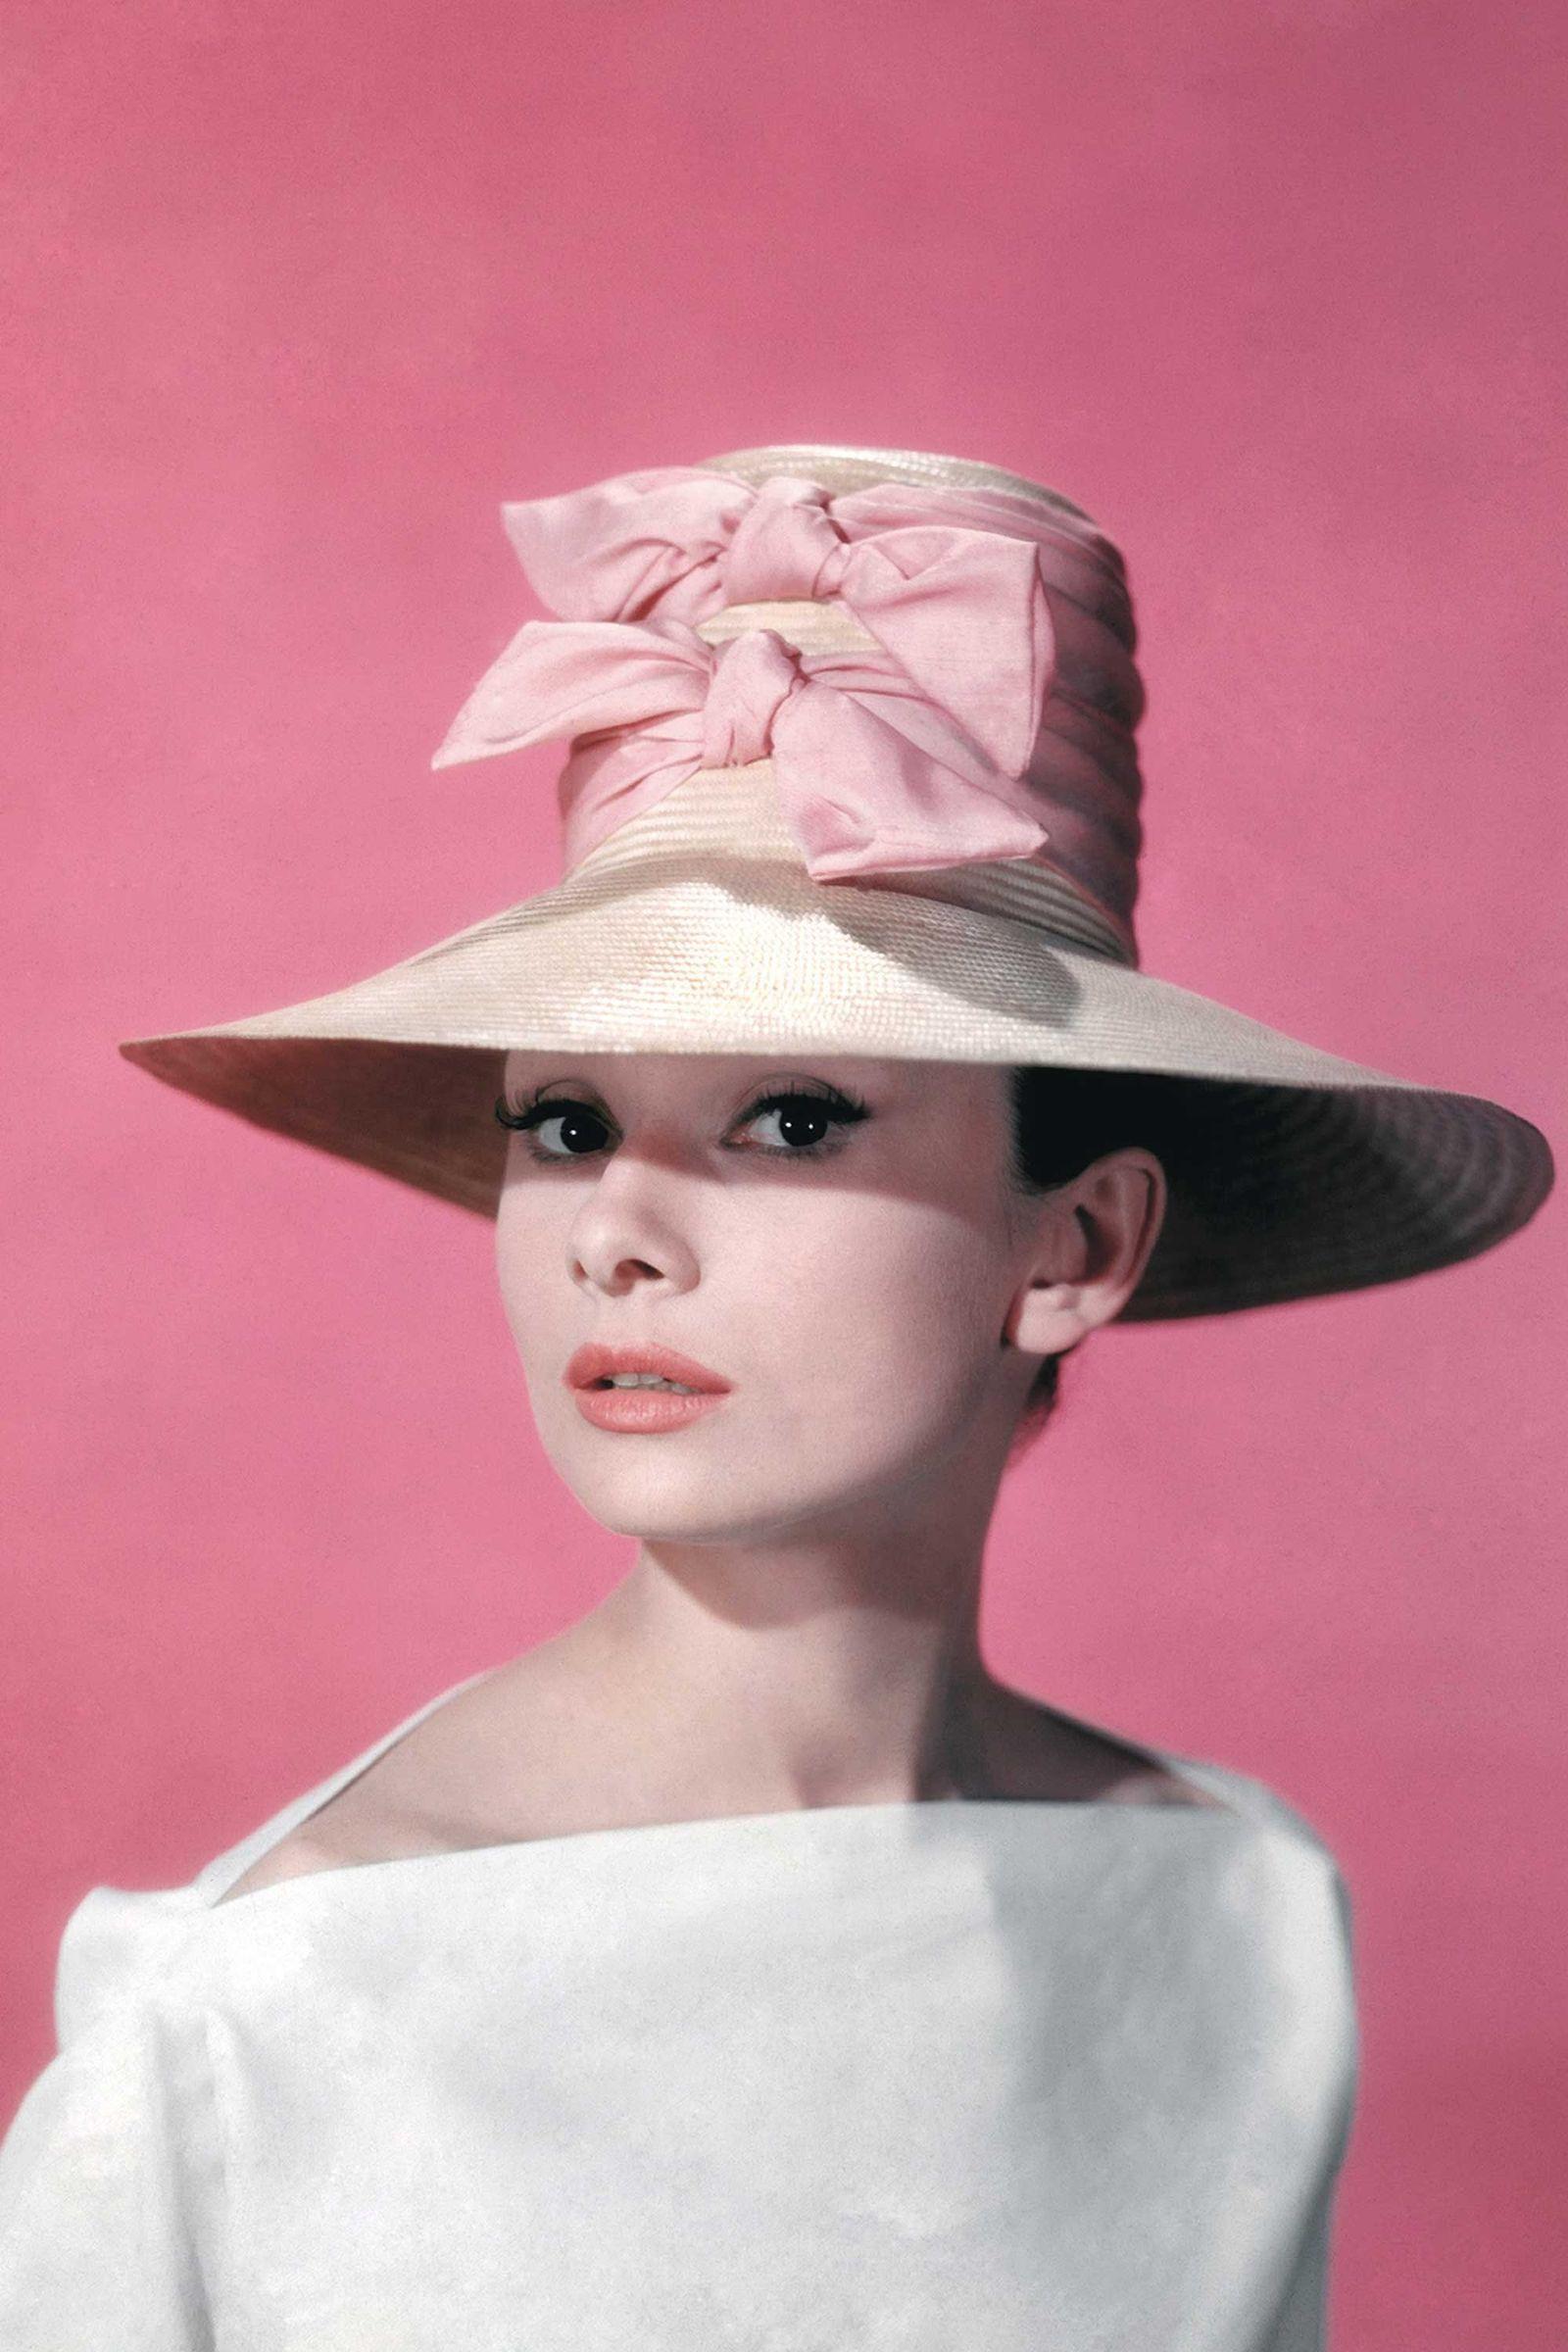 The 44 Most Glamorous Photos of Audrey Hepburn | Pinterest | Audrey ...